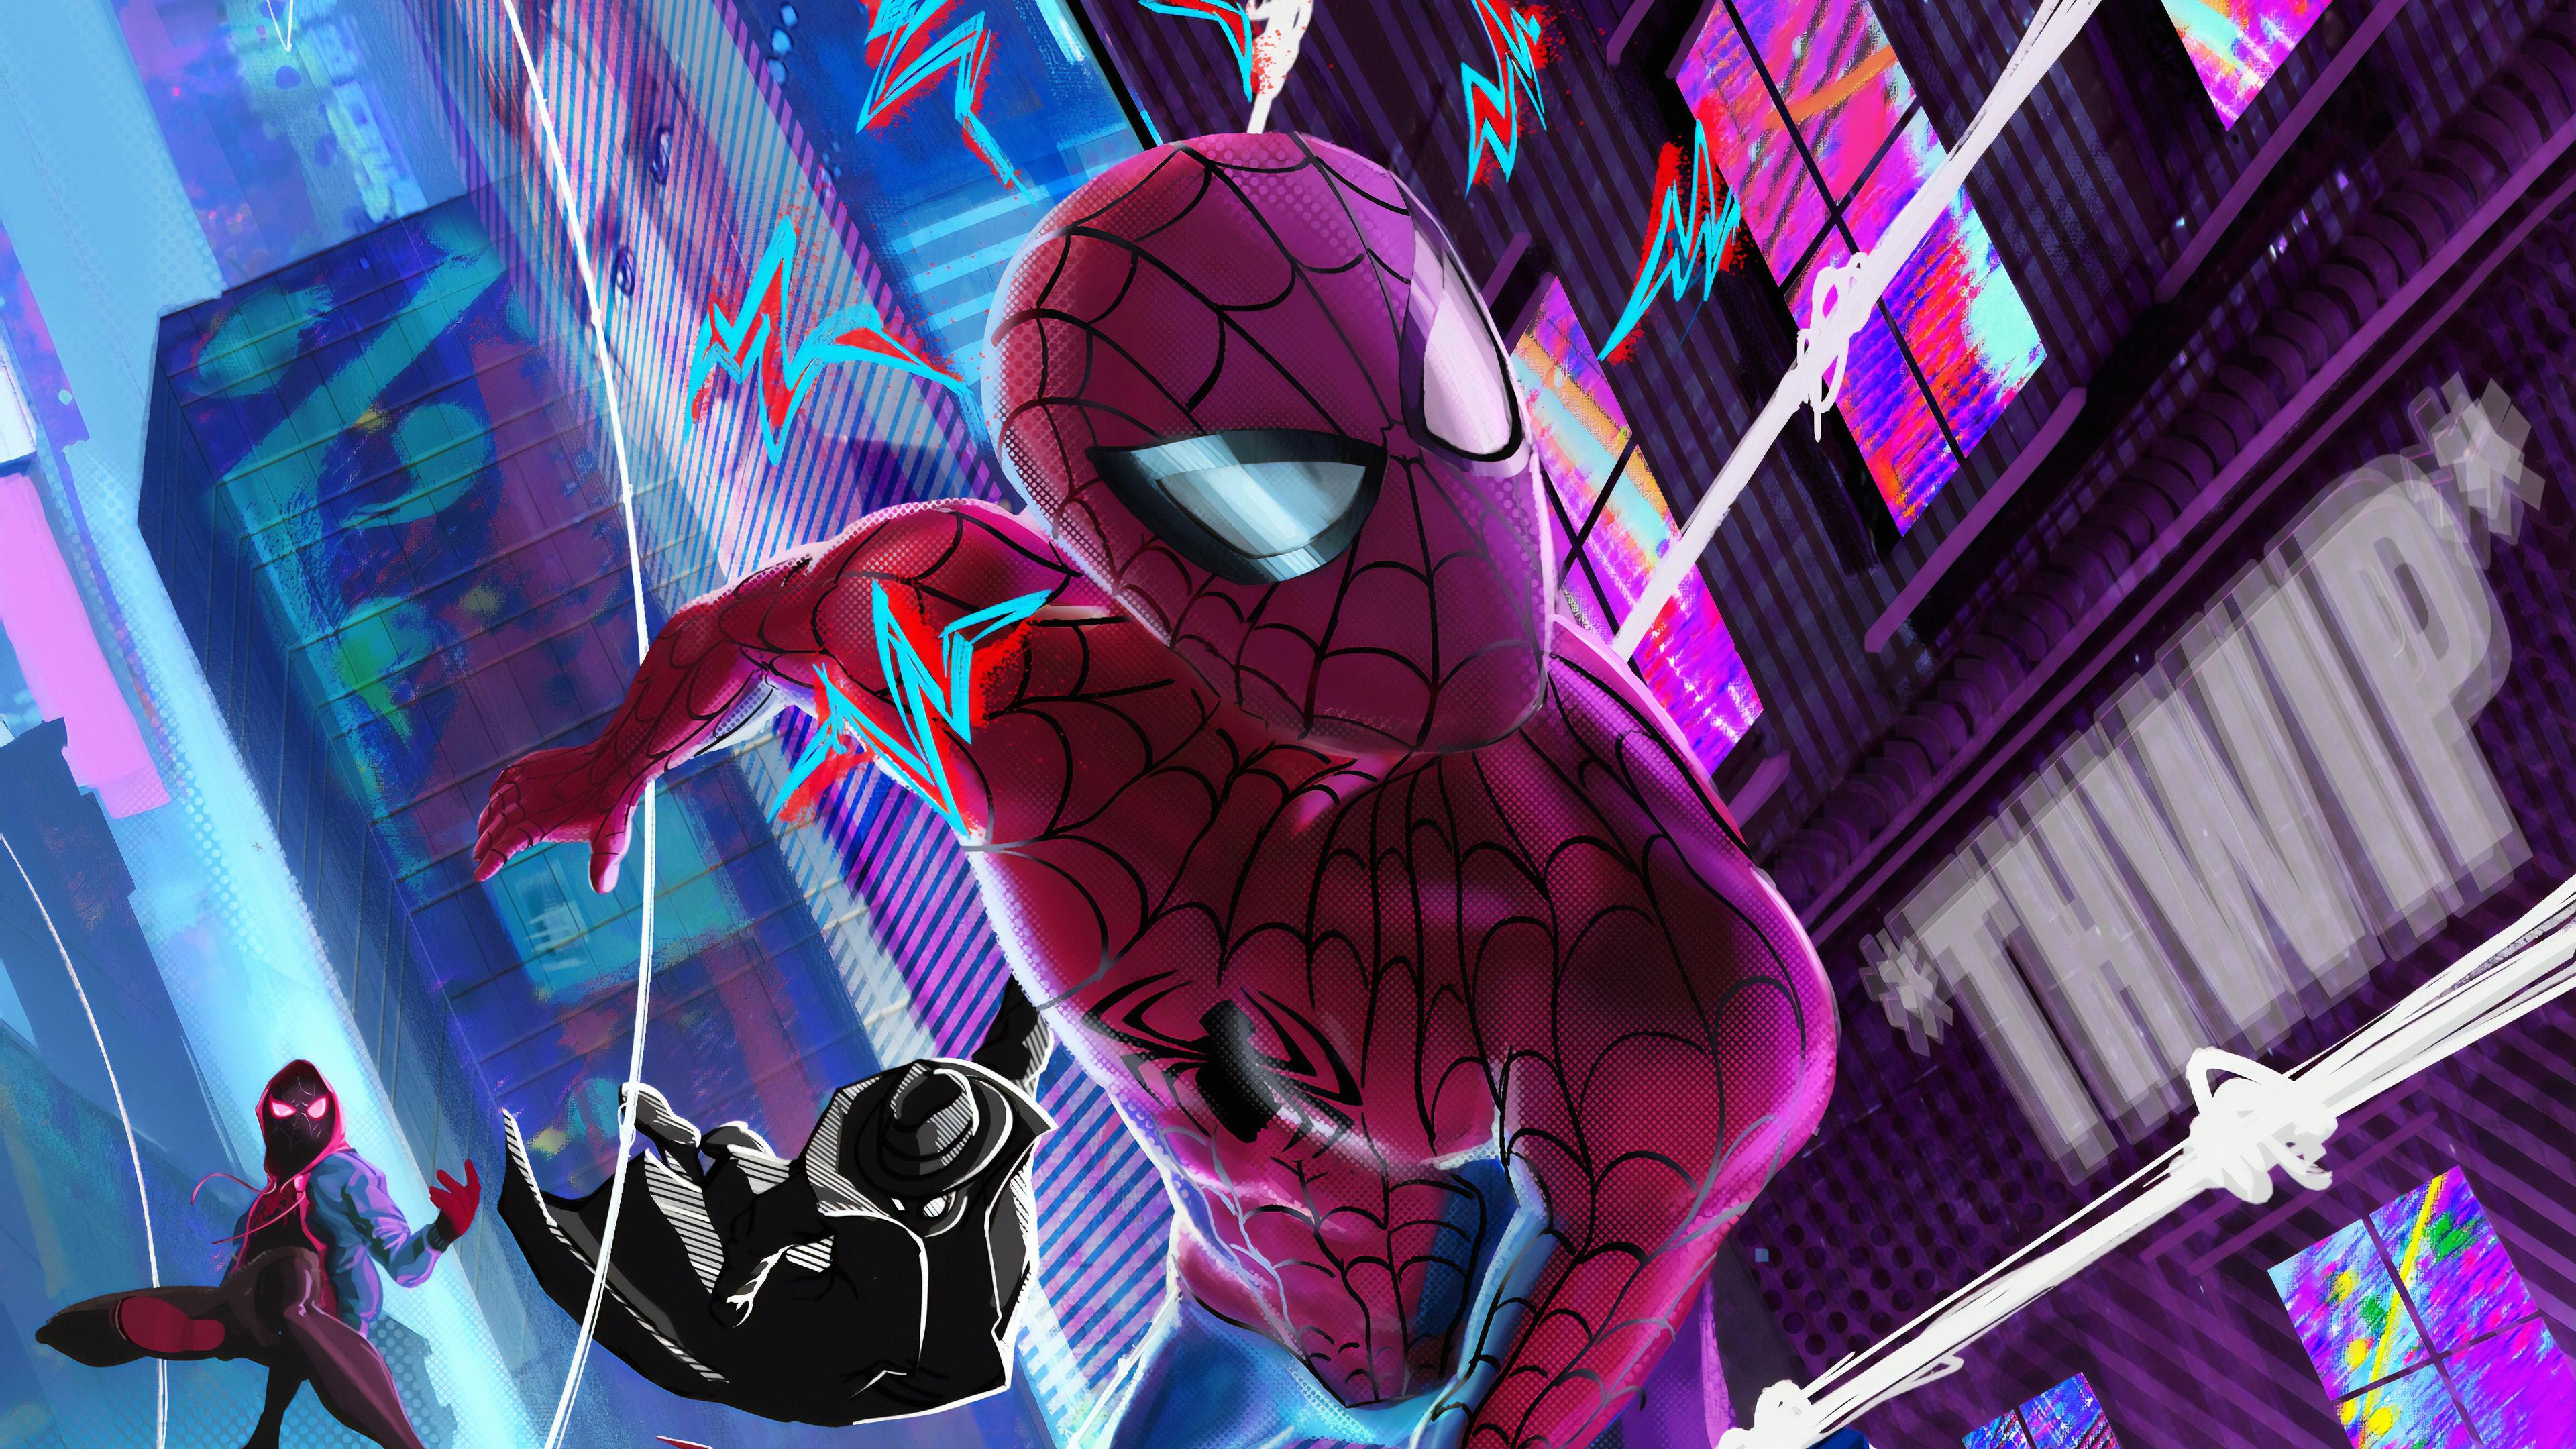 spider verse gang 1565052980 - Spider Verse Gang - superheroes wallpapers, spiderman wallpapers, hd-wallpapers, digital art wallpapers, artwork wallpapers, artstation wallpapers, art wallpapers, 4k-wallpapers